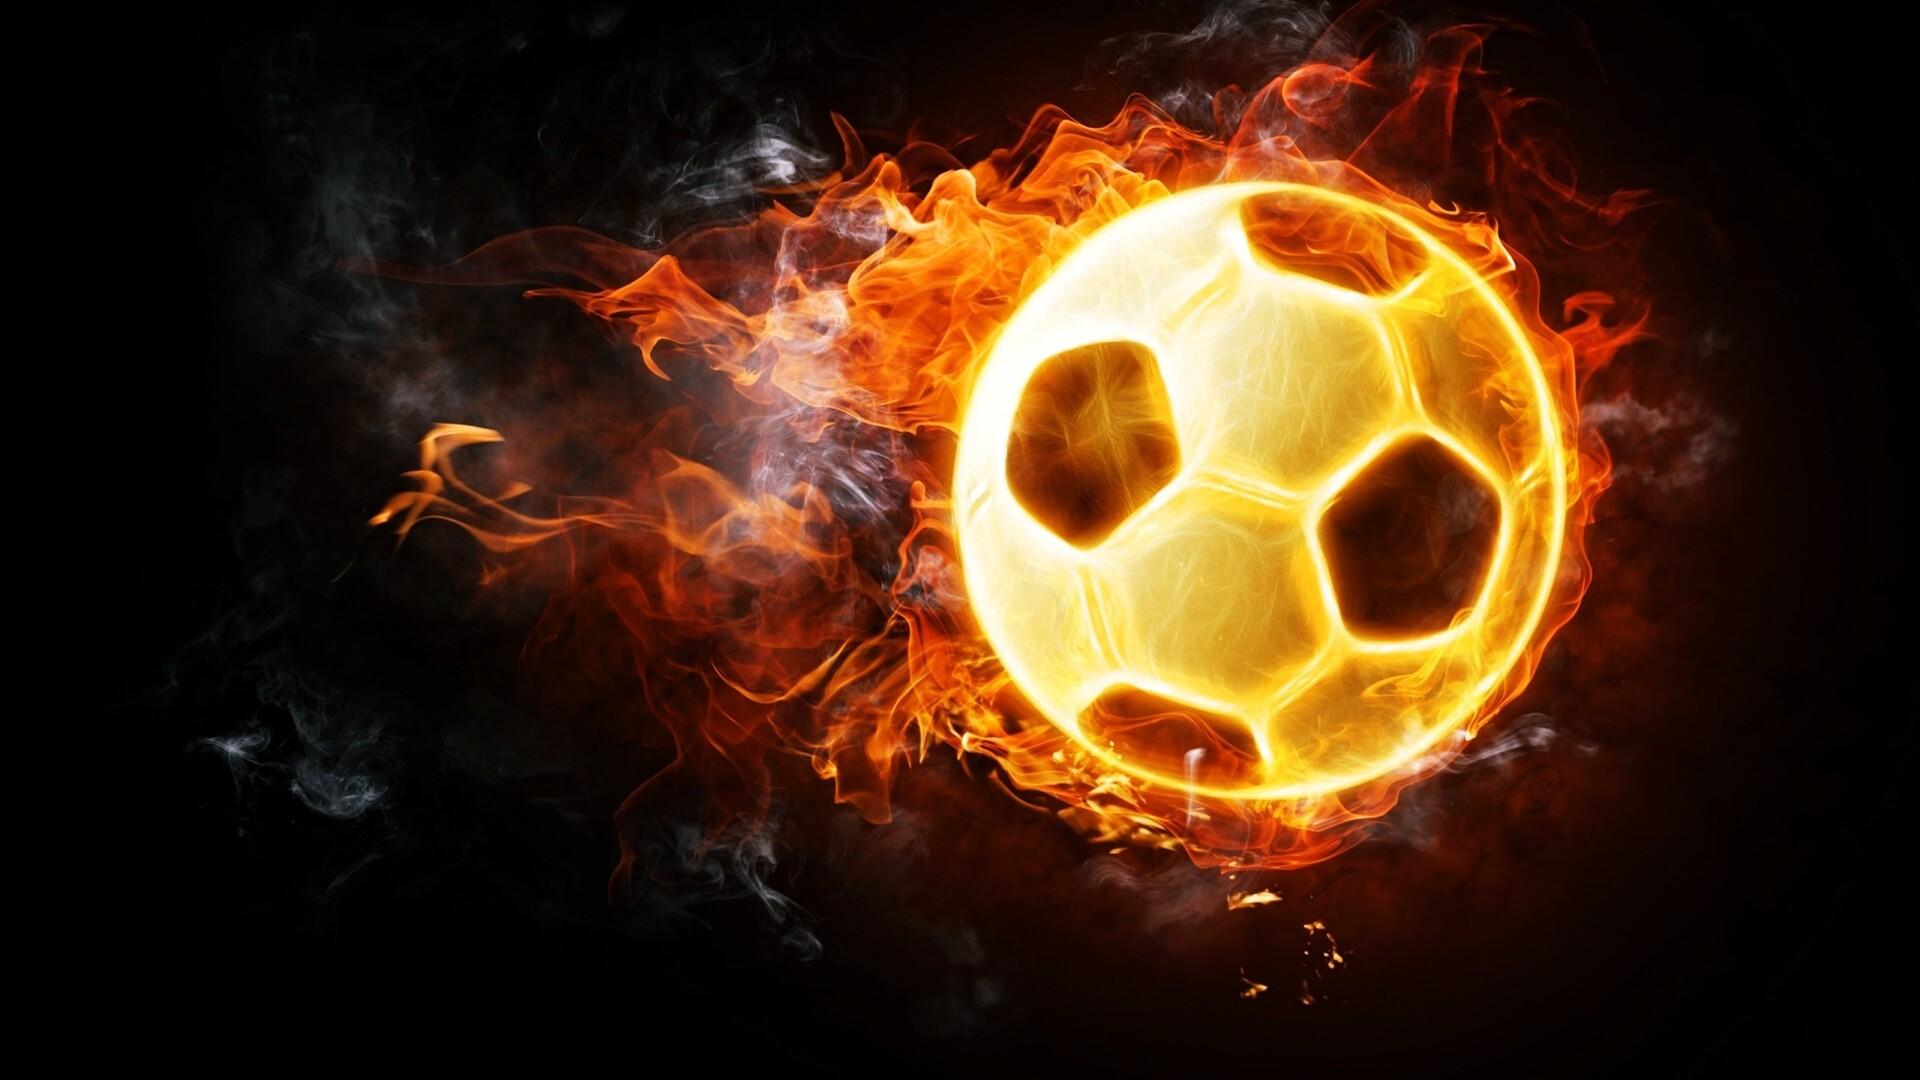 1920x1080 football soccer fire ball 4k laptop full hd 1080p hd 4k football soccer fire ball 4k f4g voltagebd Choice Image